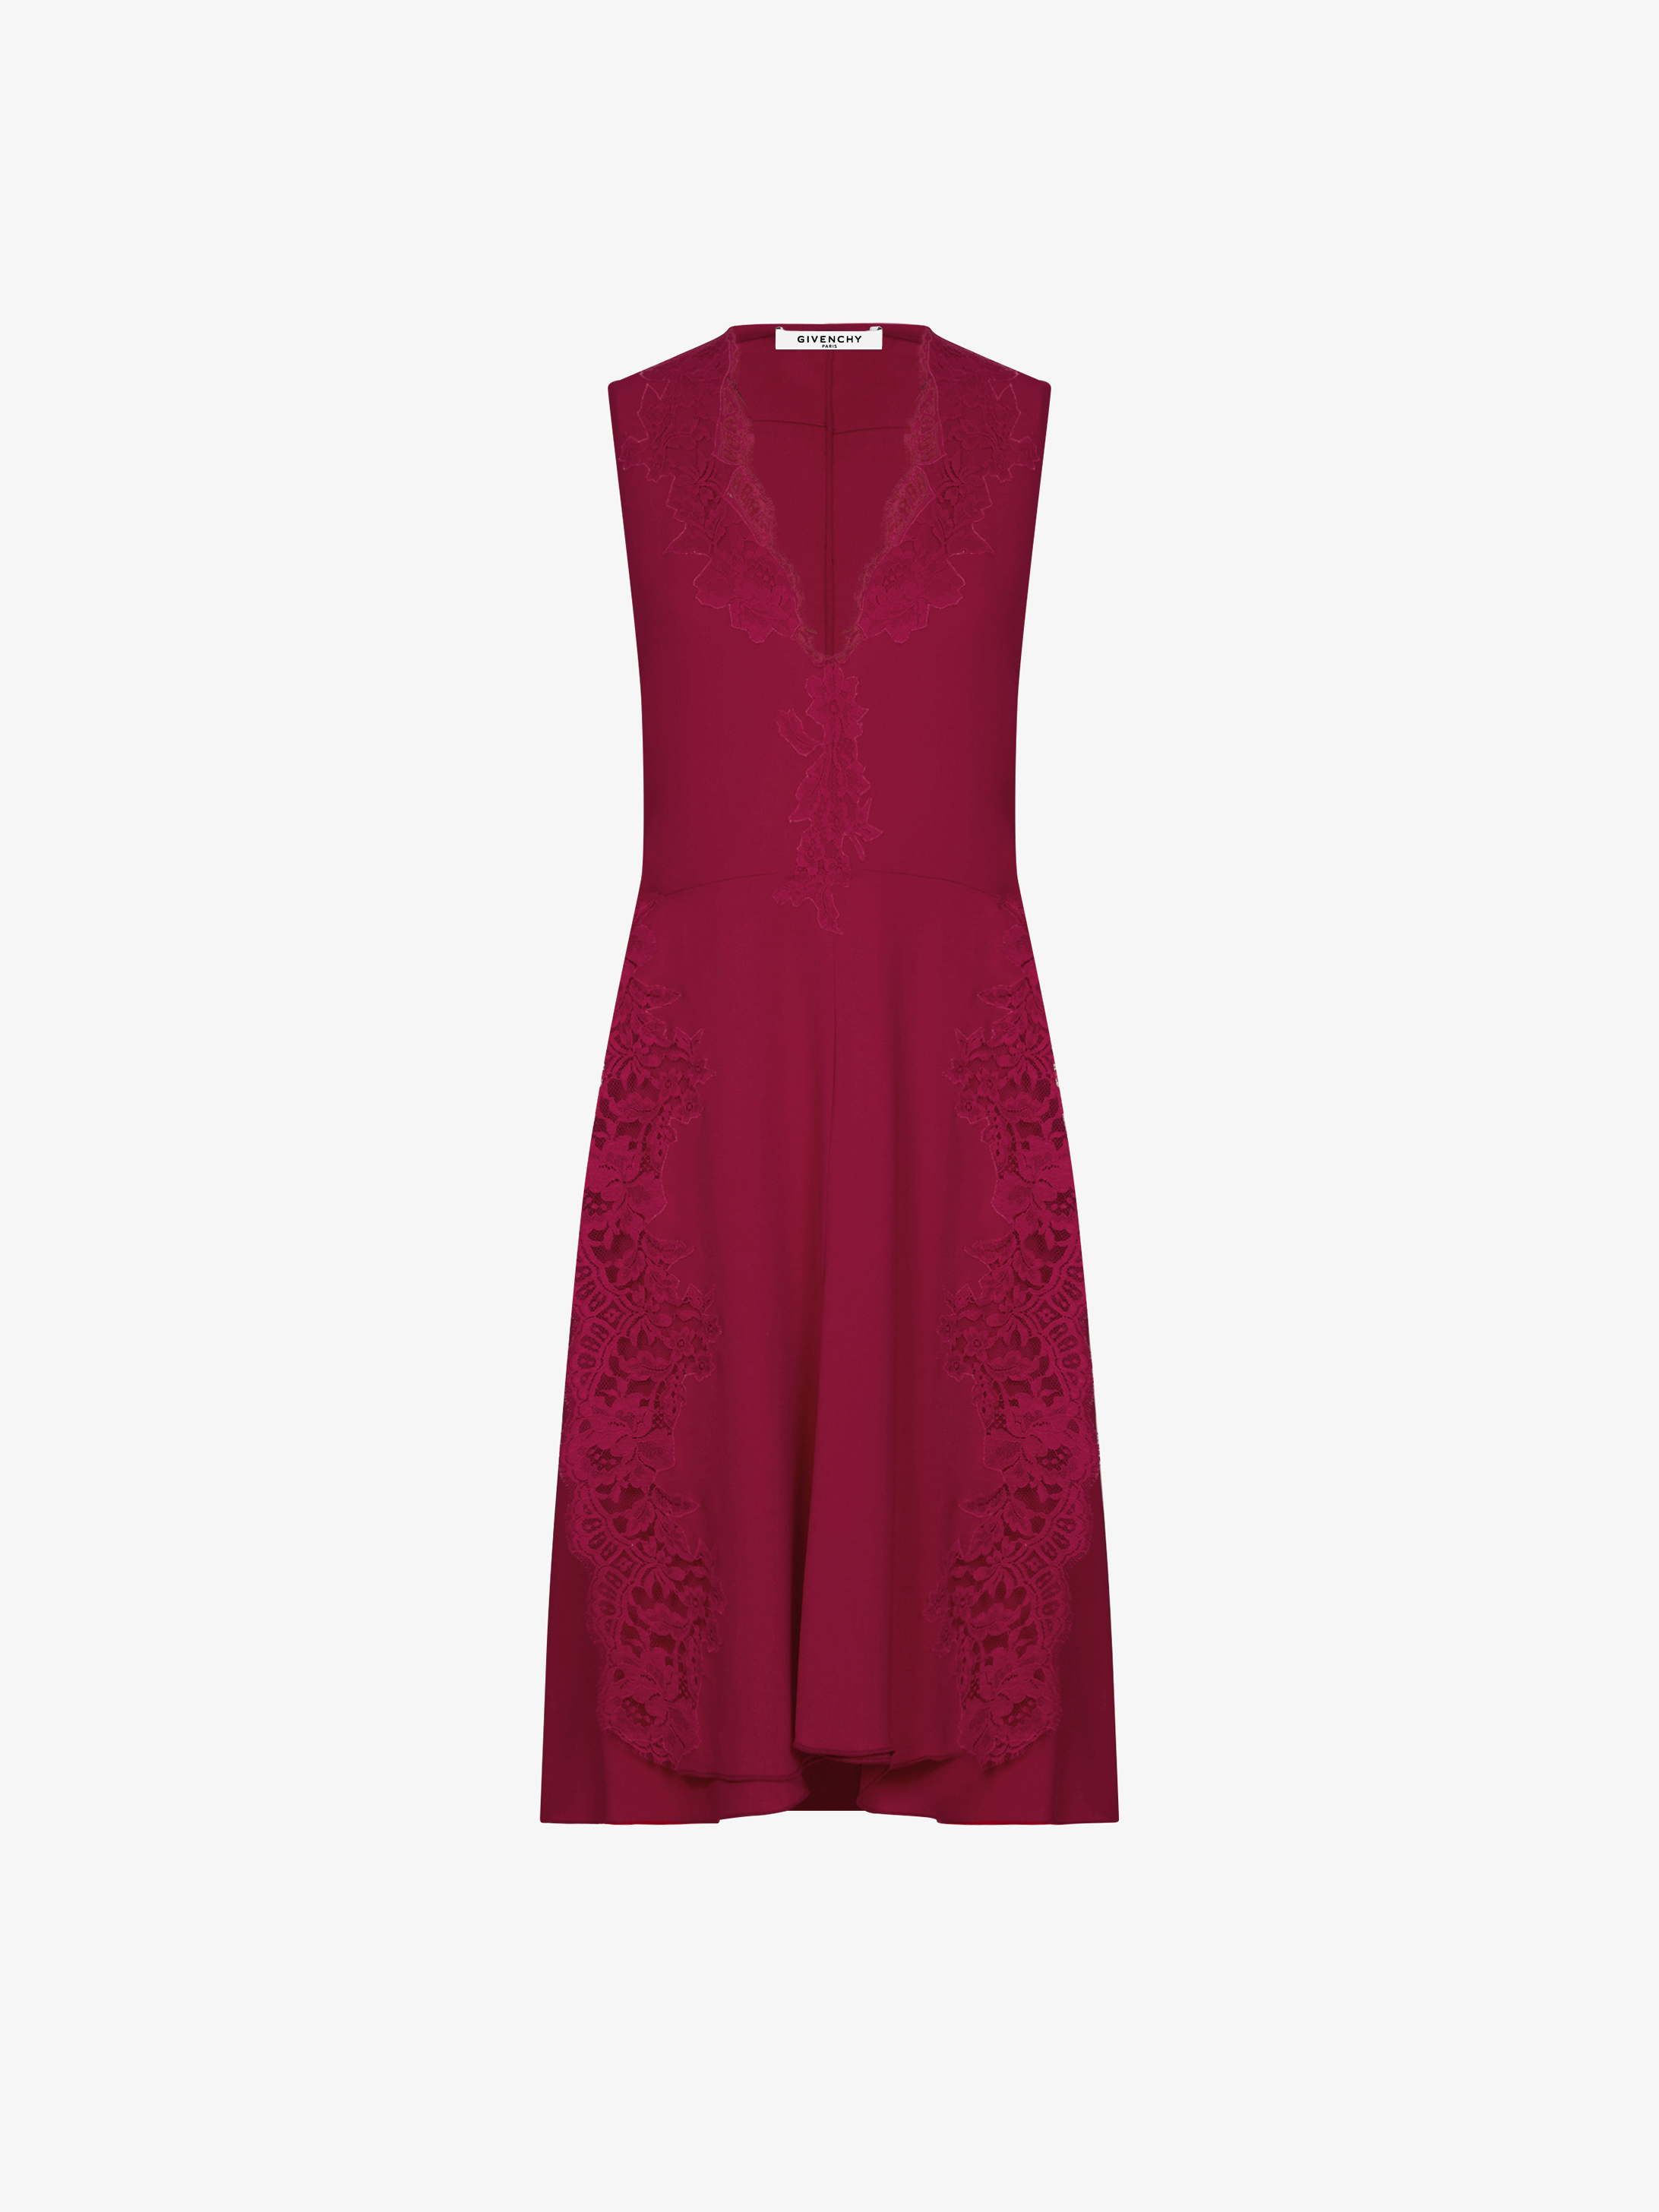 Lace details and patchwork short dress